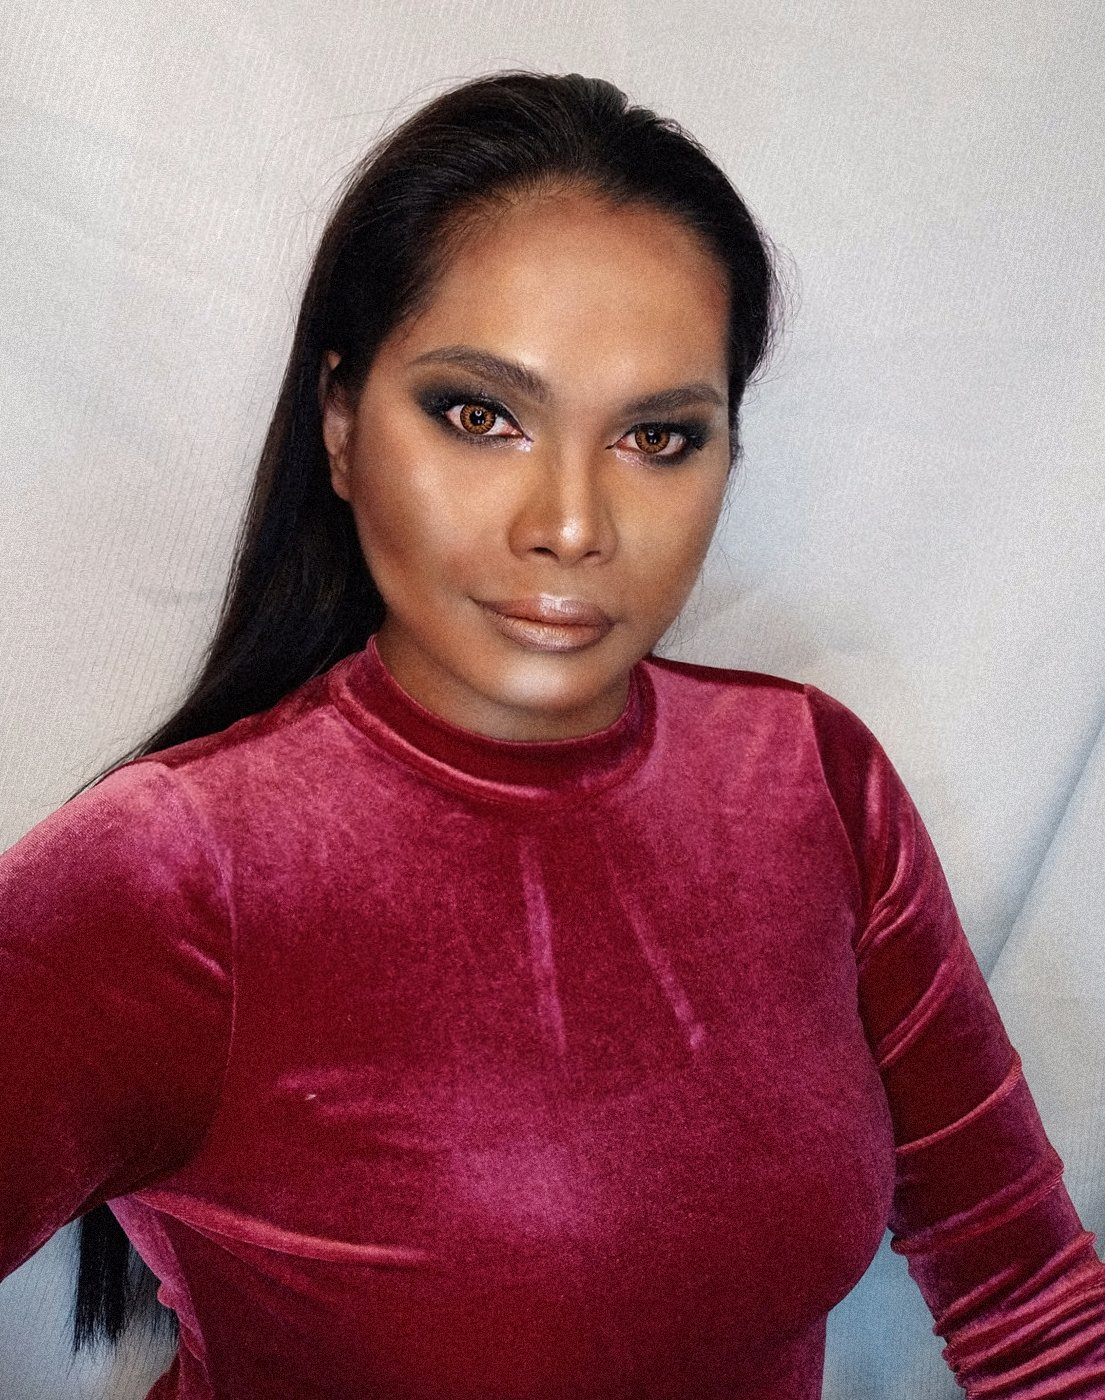 Ladyboy Kaycee, Filipino escort in Manila